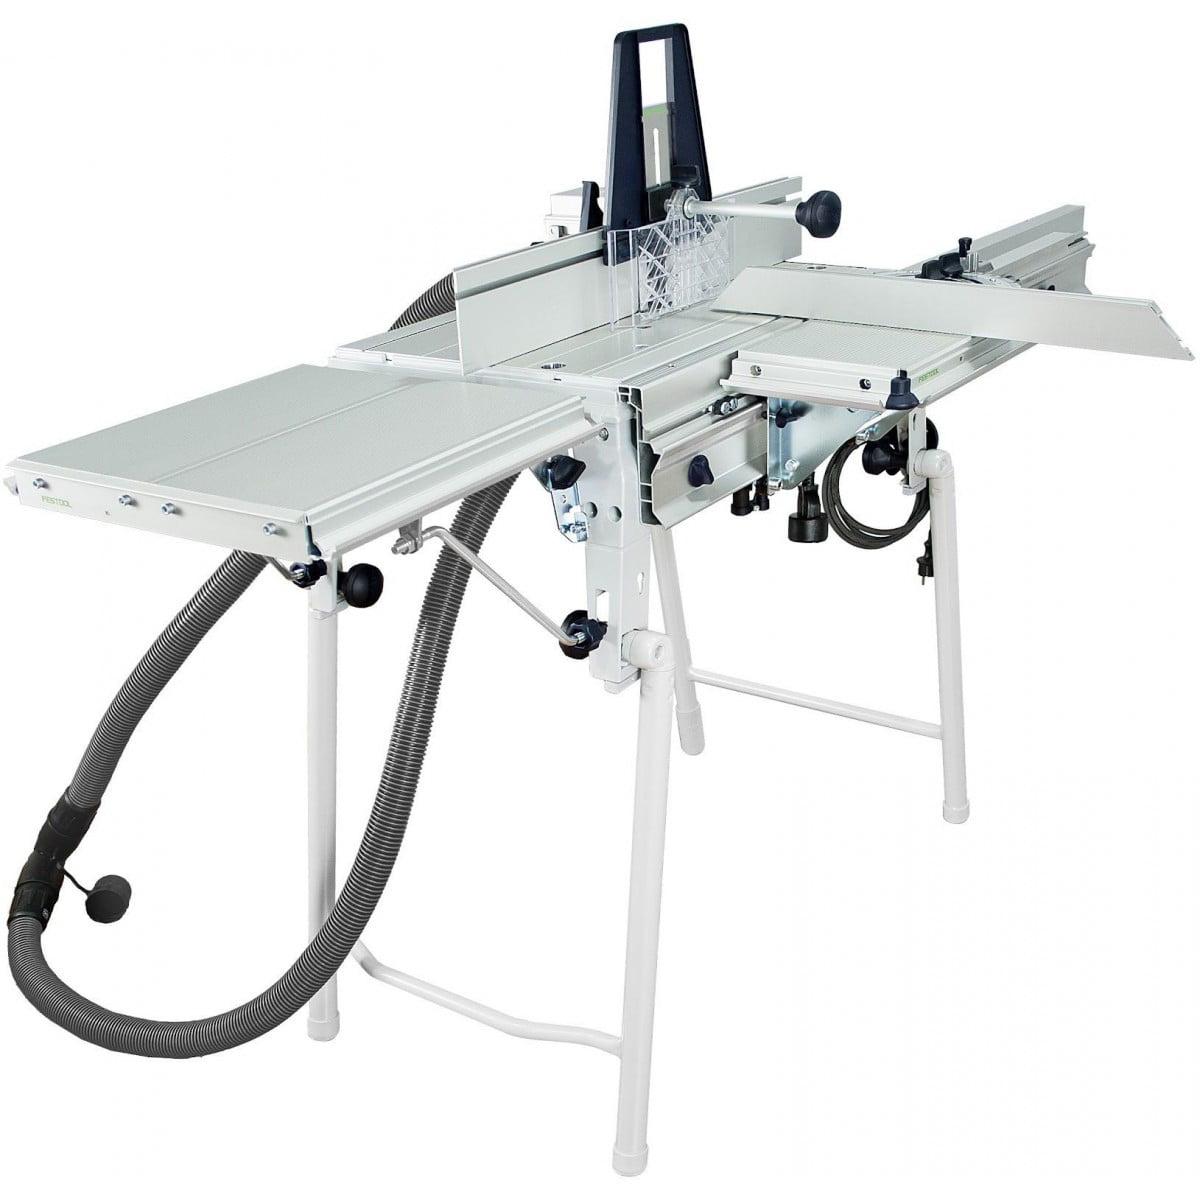 Festool 203158 CMS-GE Router Table Set